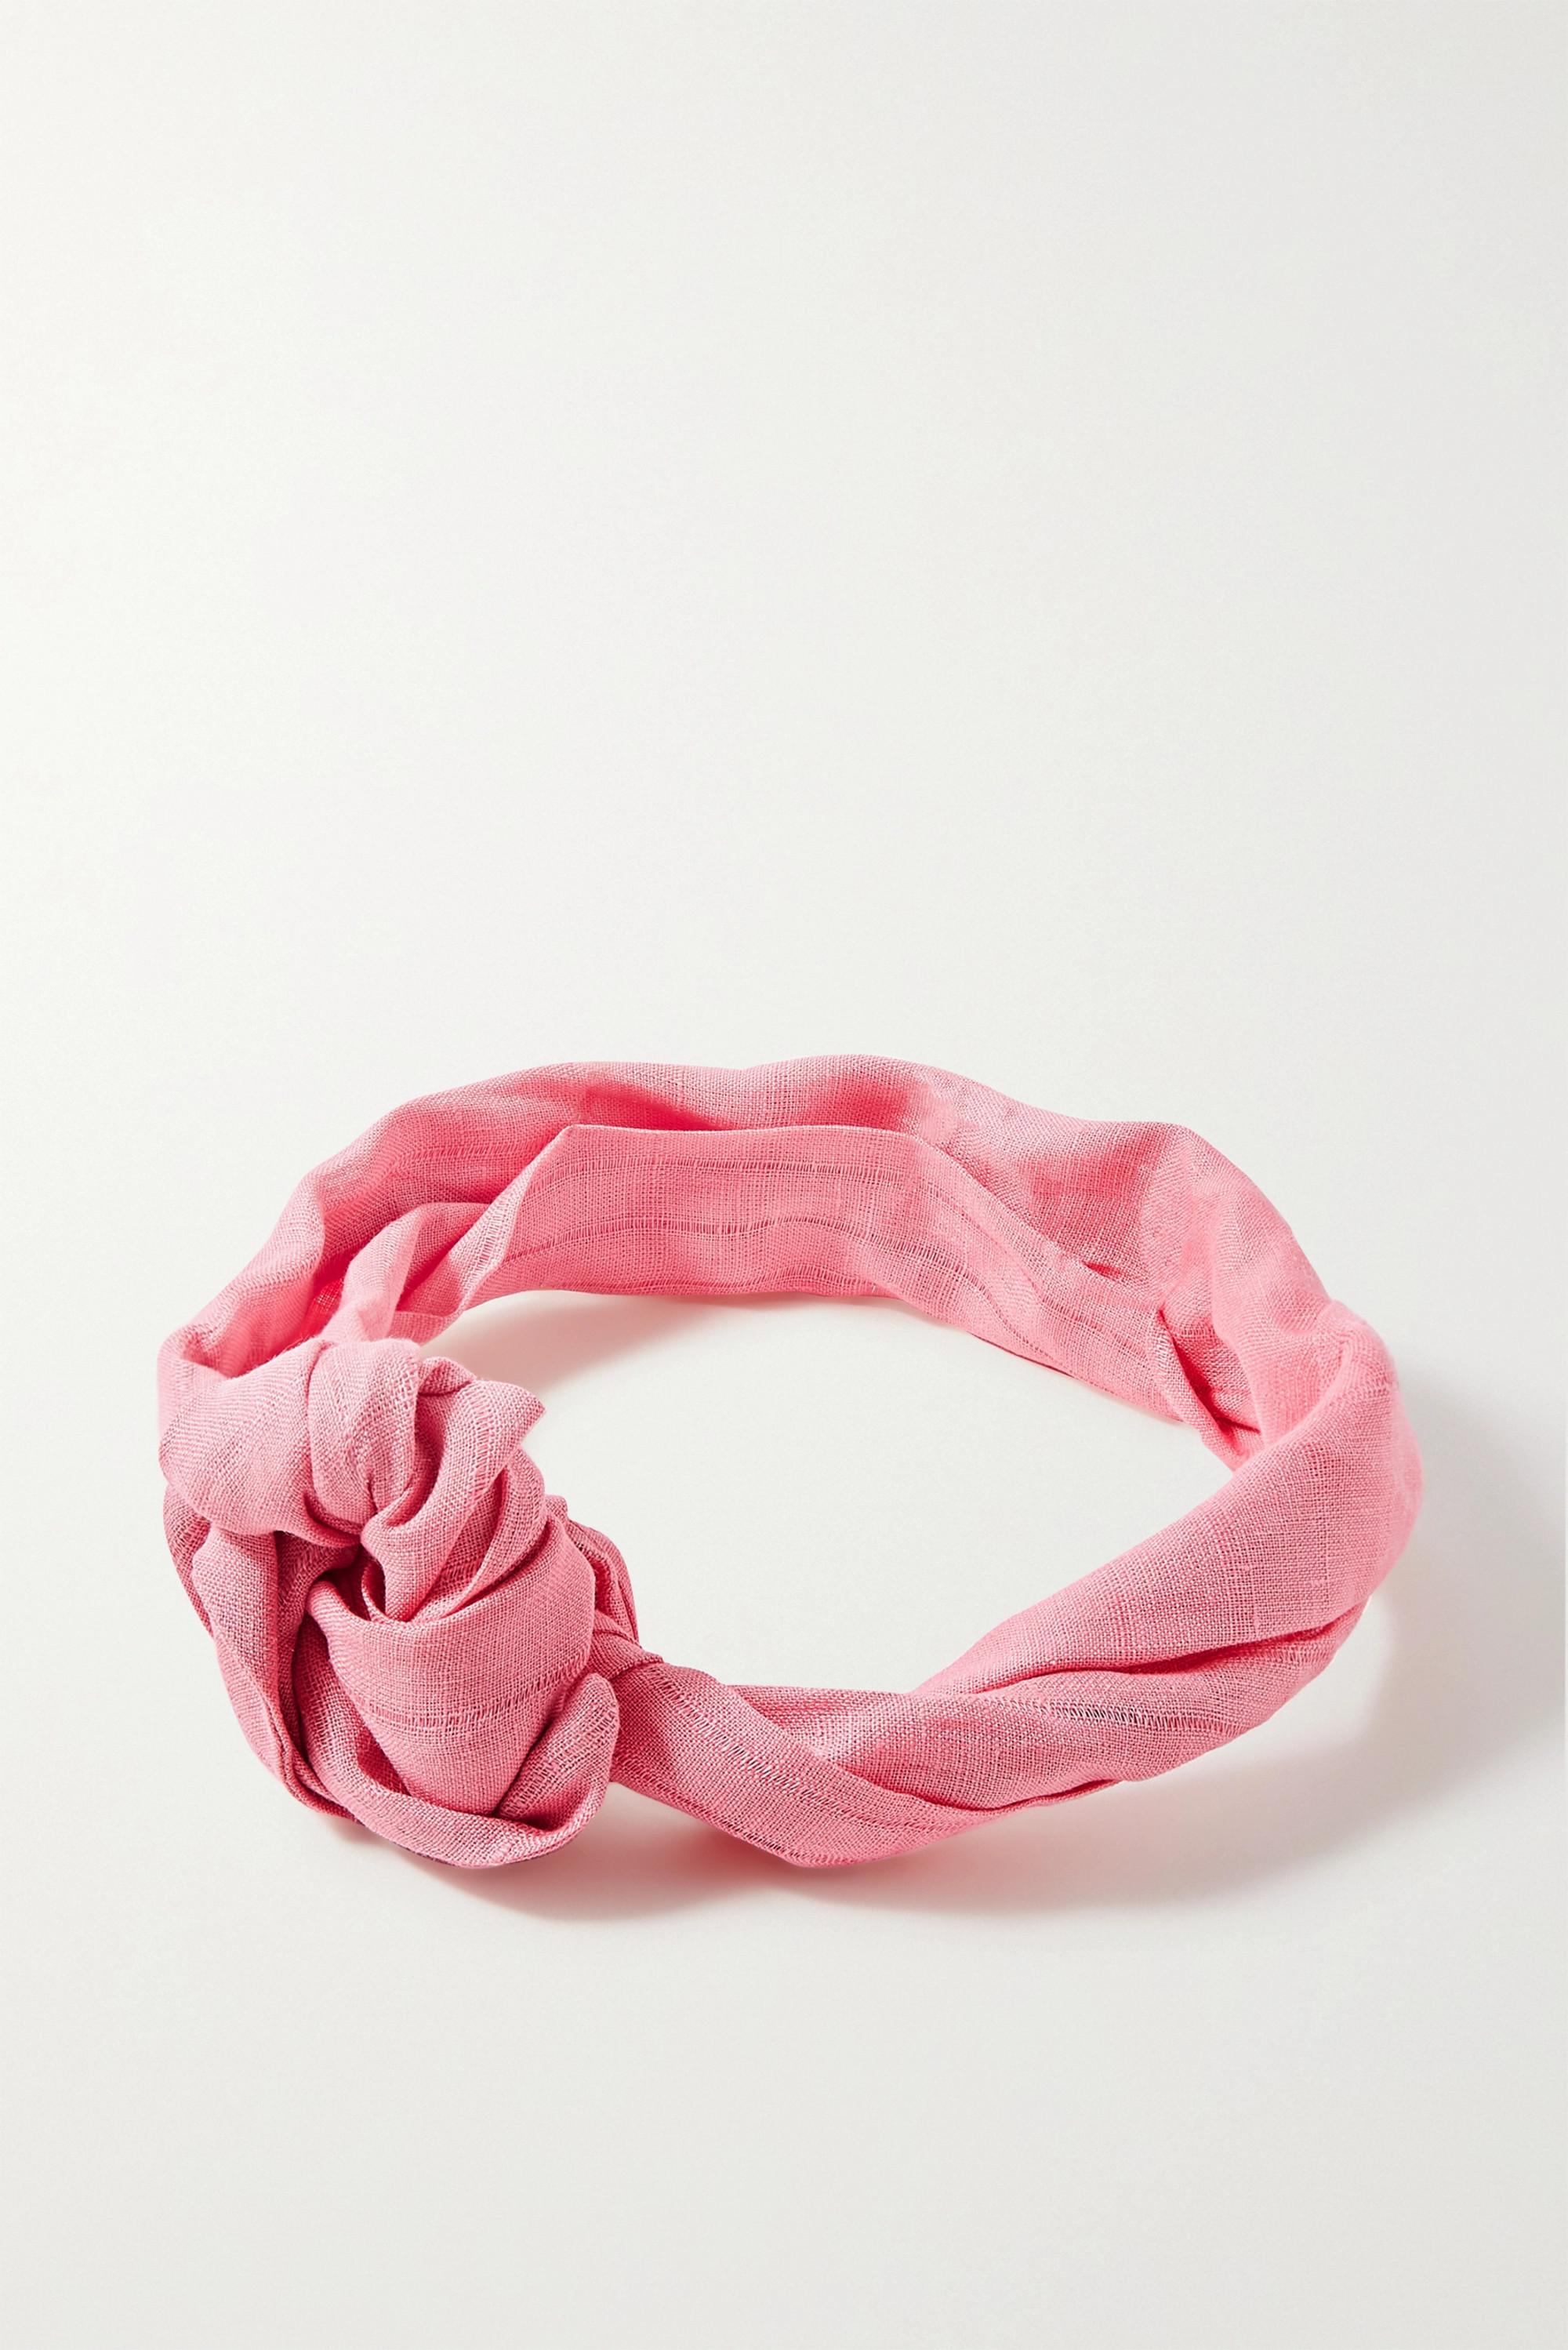 Cult Gaia Turband knotted linen headband